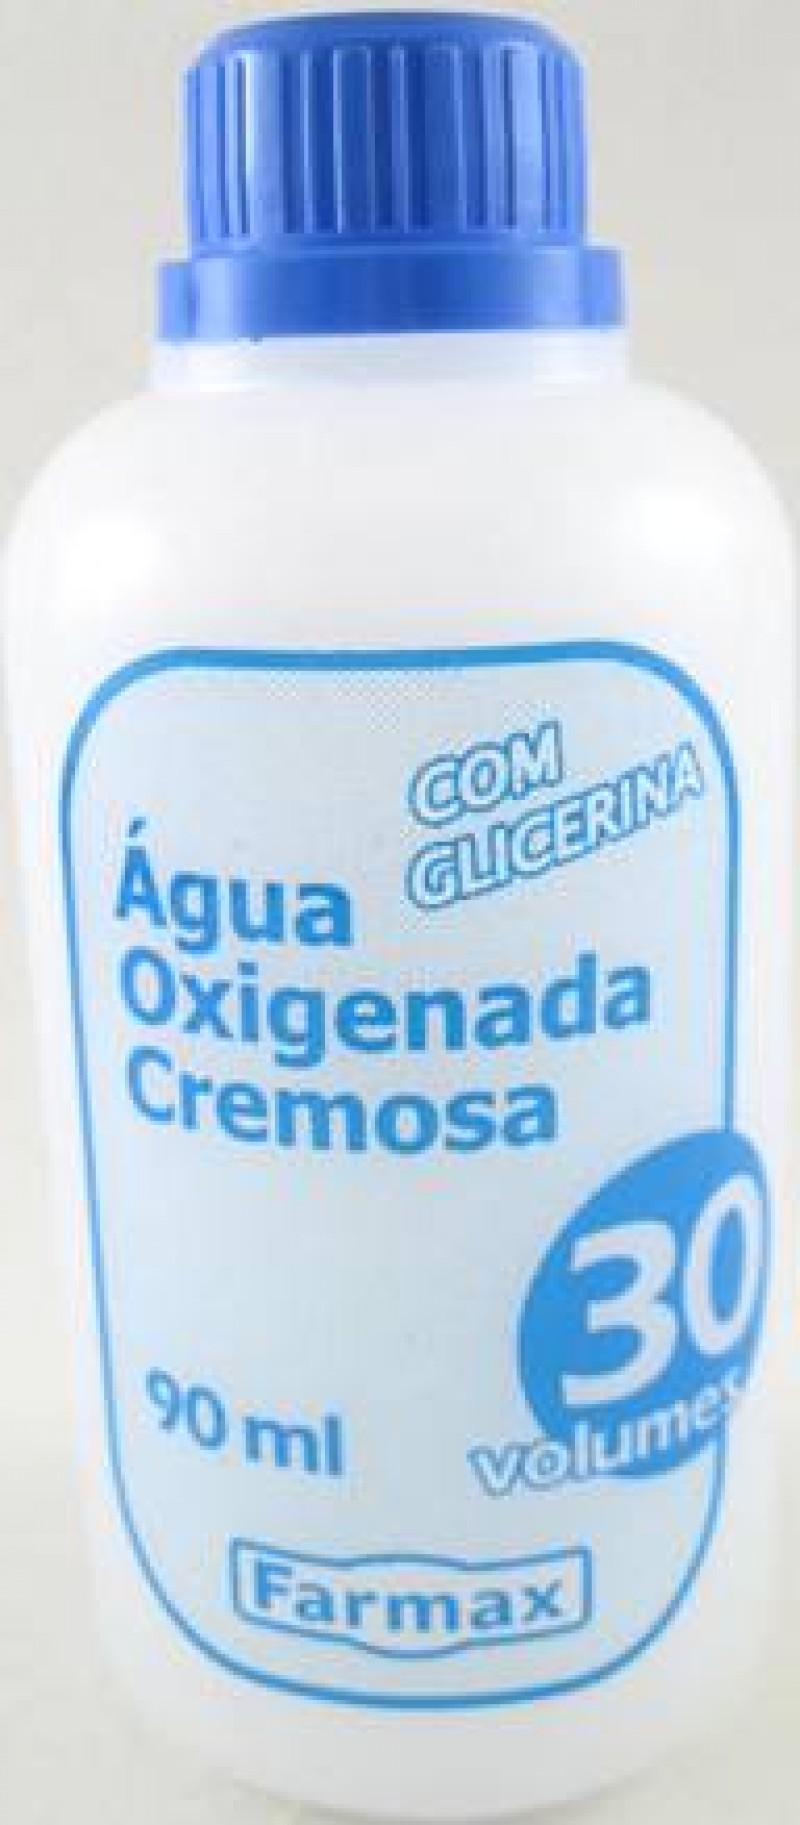 Foto 1 - Água Oxigenada Cremosa Farmax 30 Volumes 90m